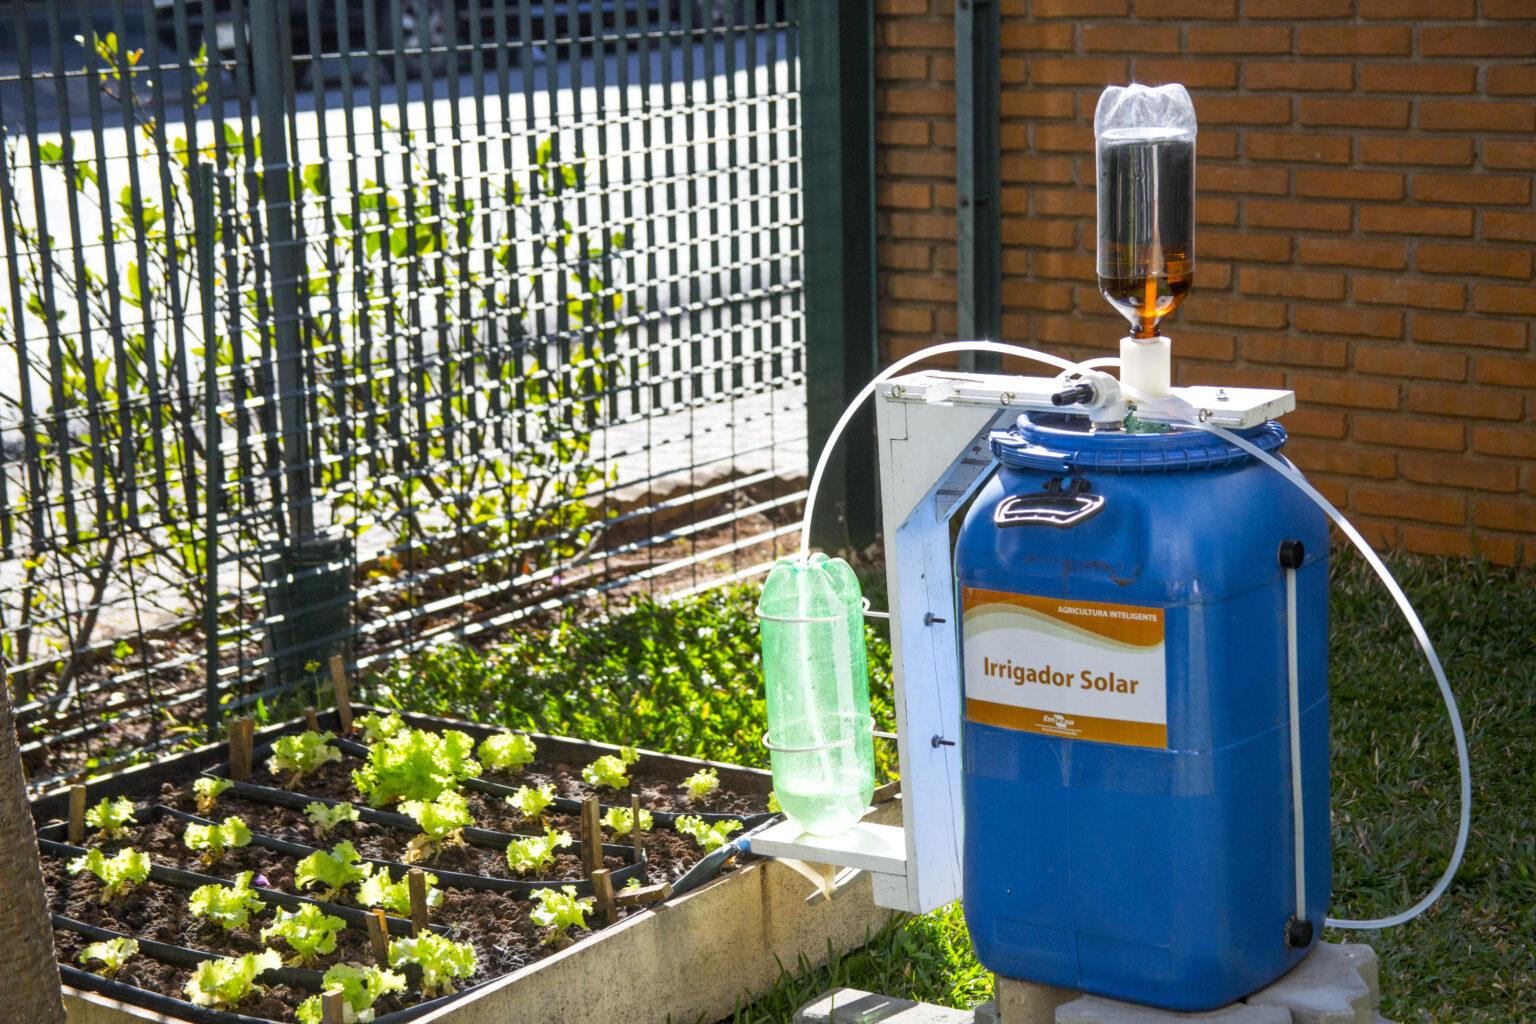 irrigador-solar-embrapa